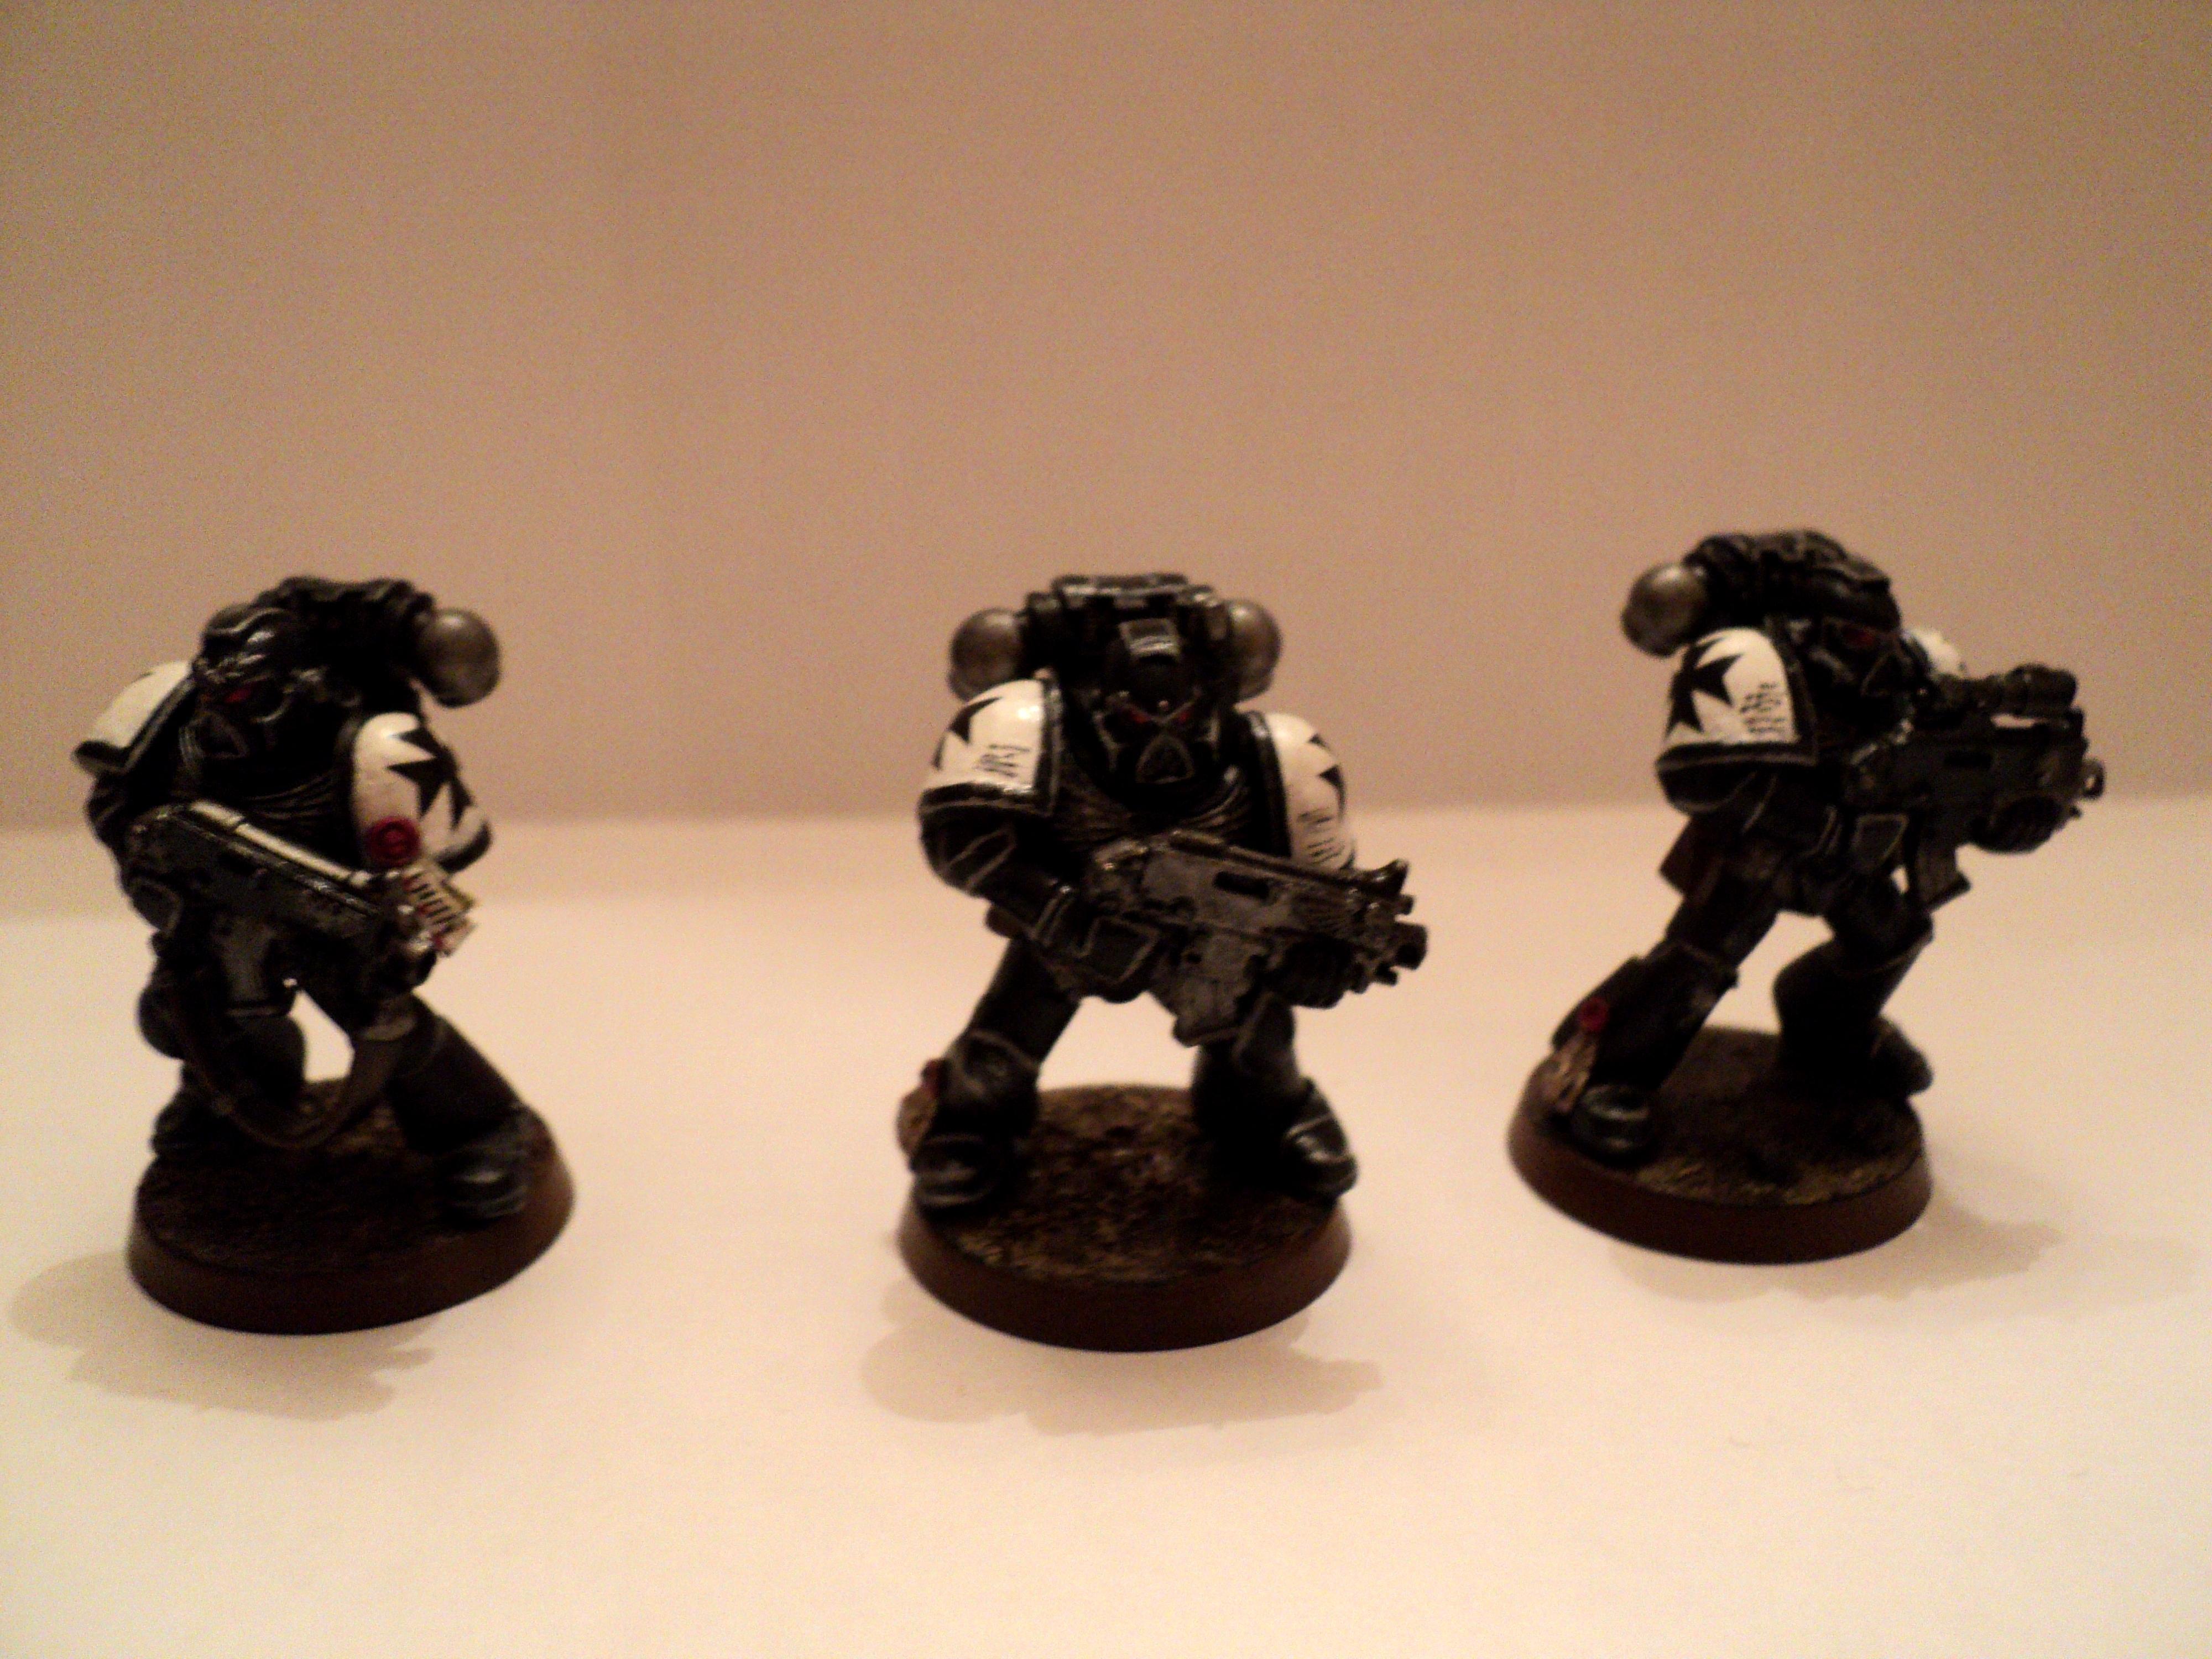 Black Templars, Necrons, Space Marines